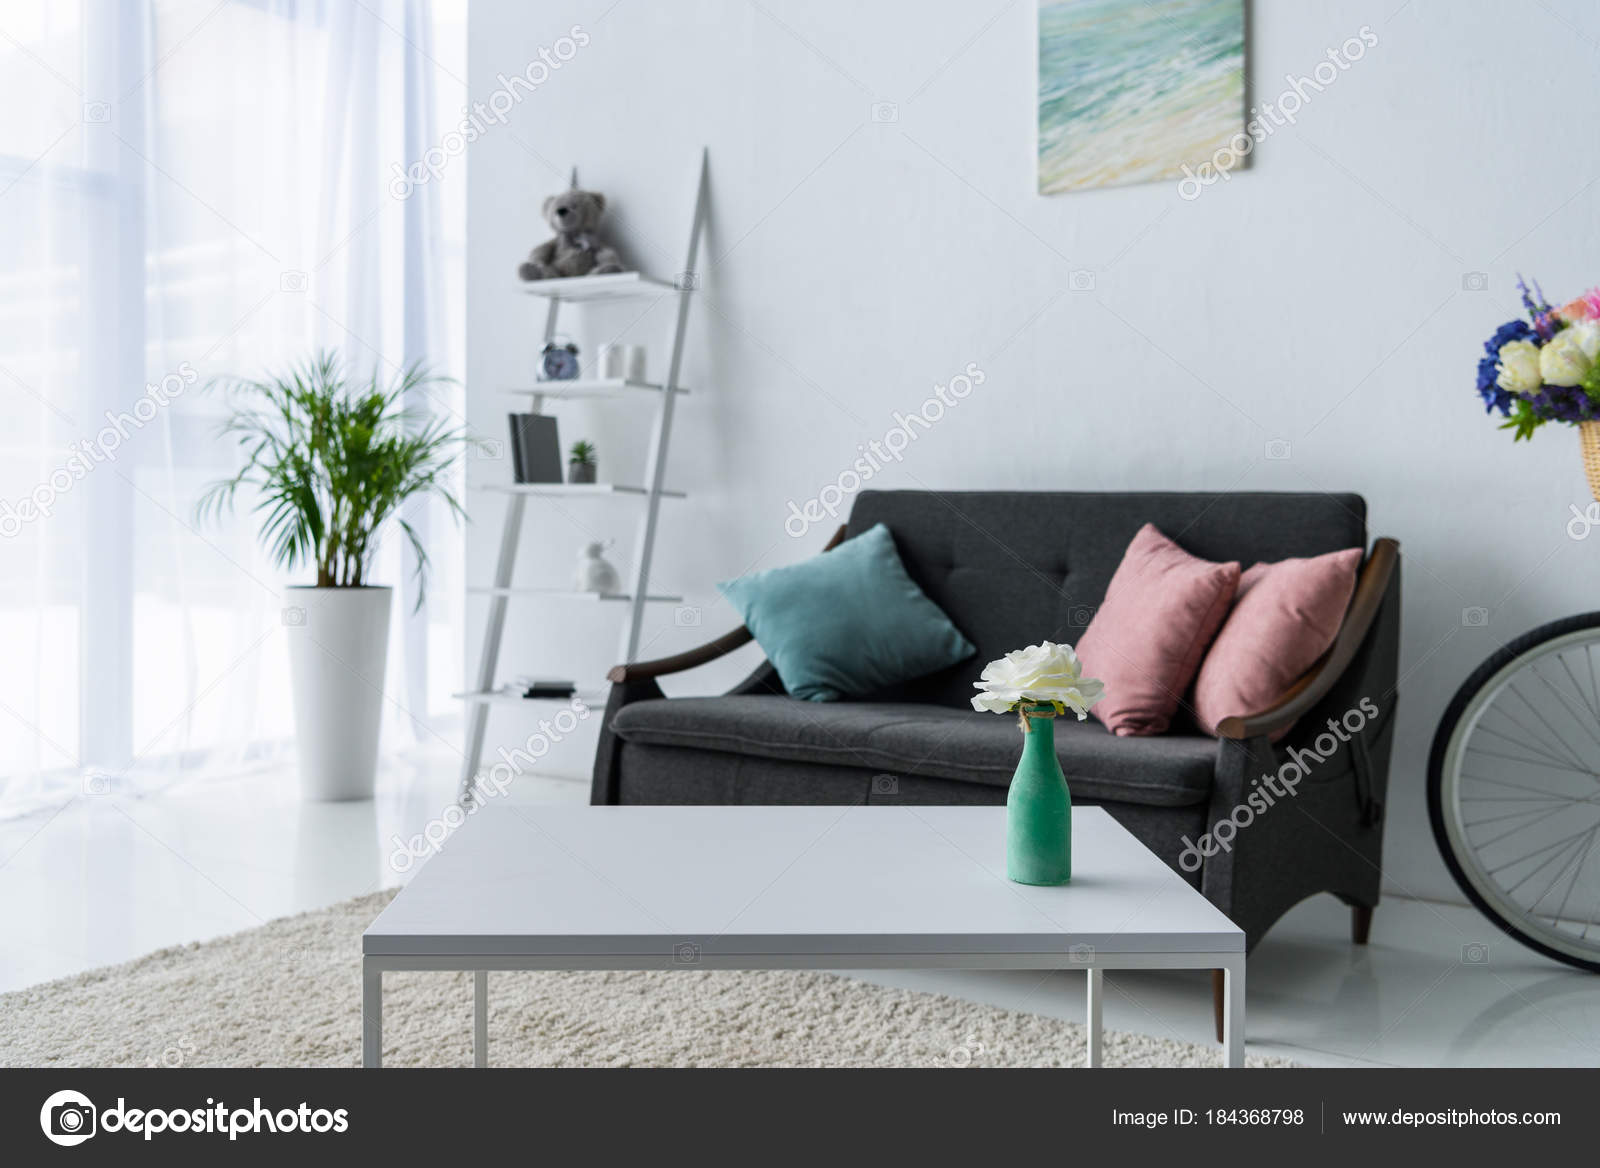 View Stylish Living Room Coffee Table Green Plant Sofa U2014 Stock Photo